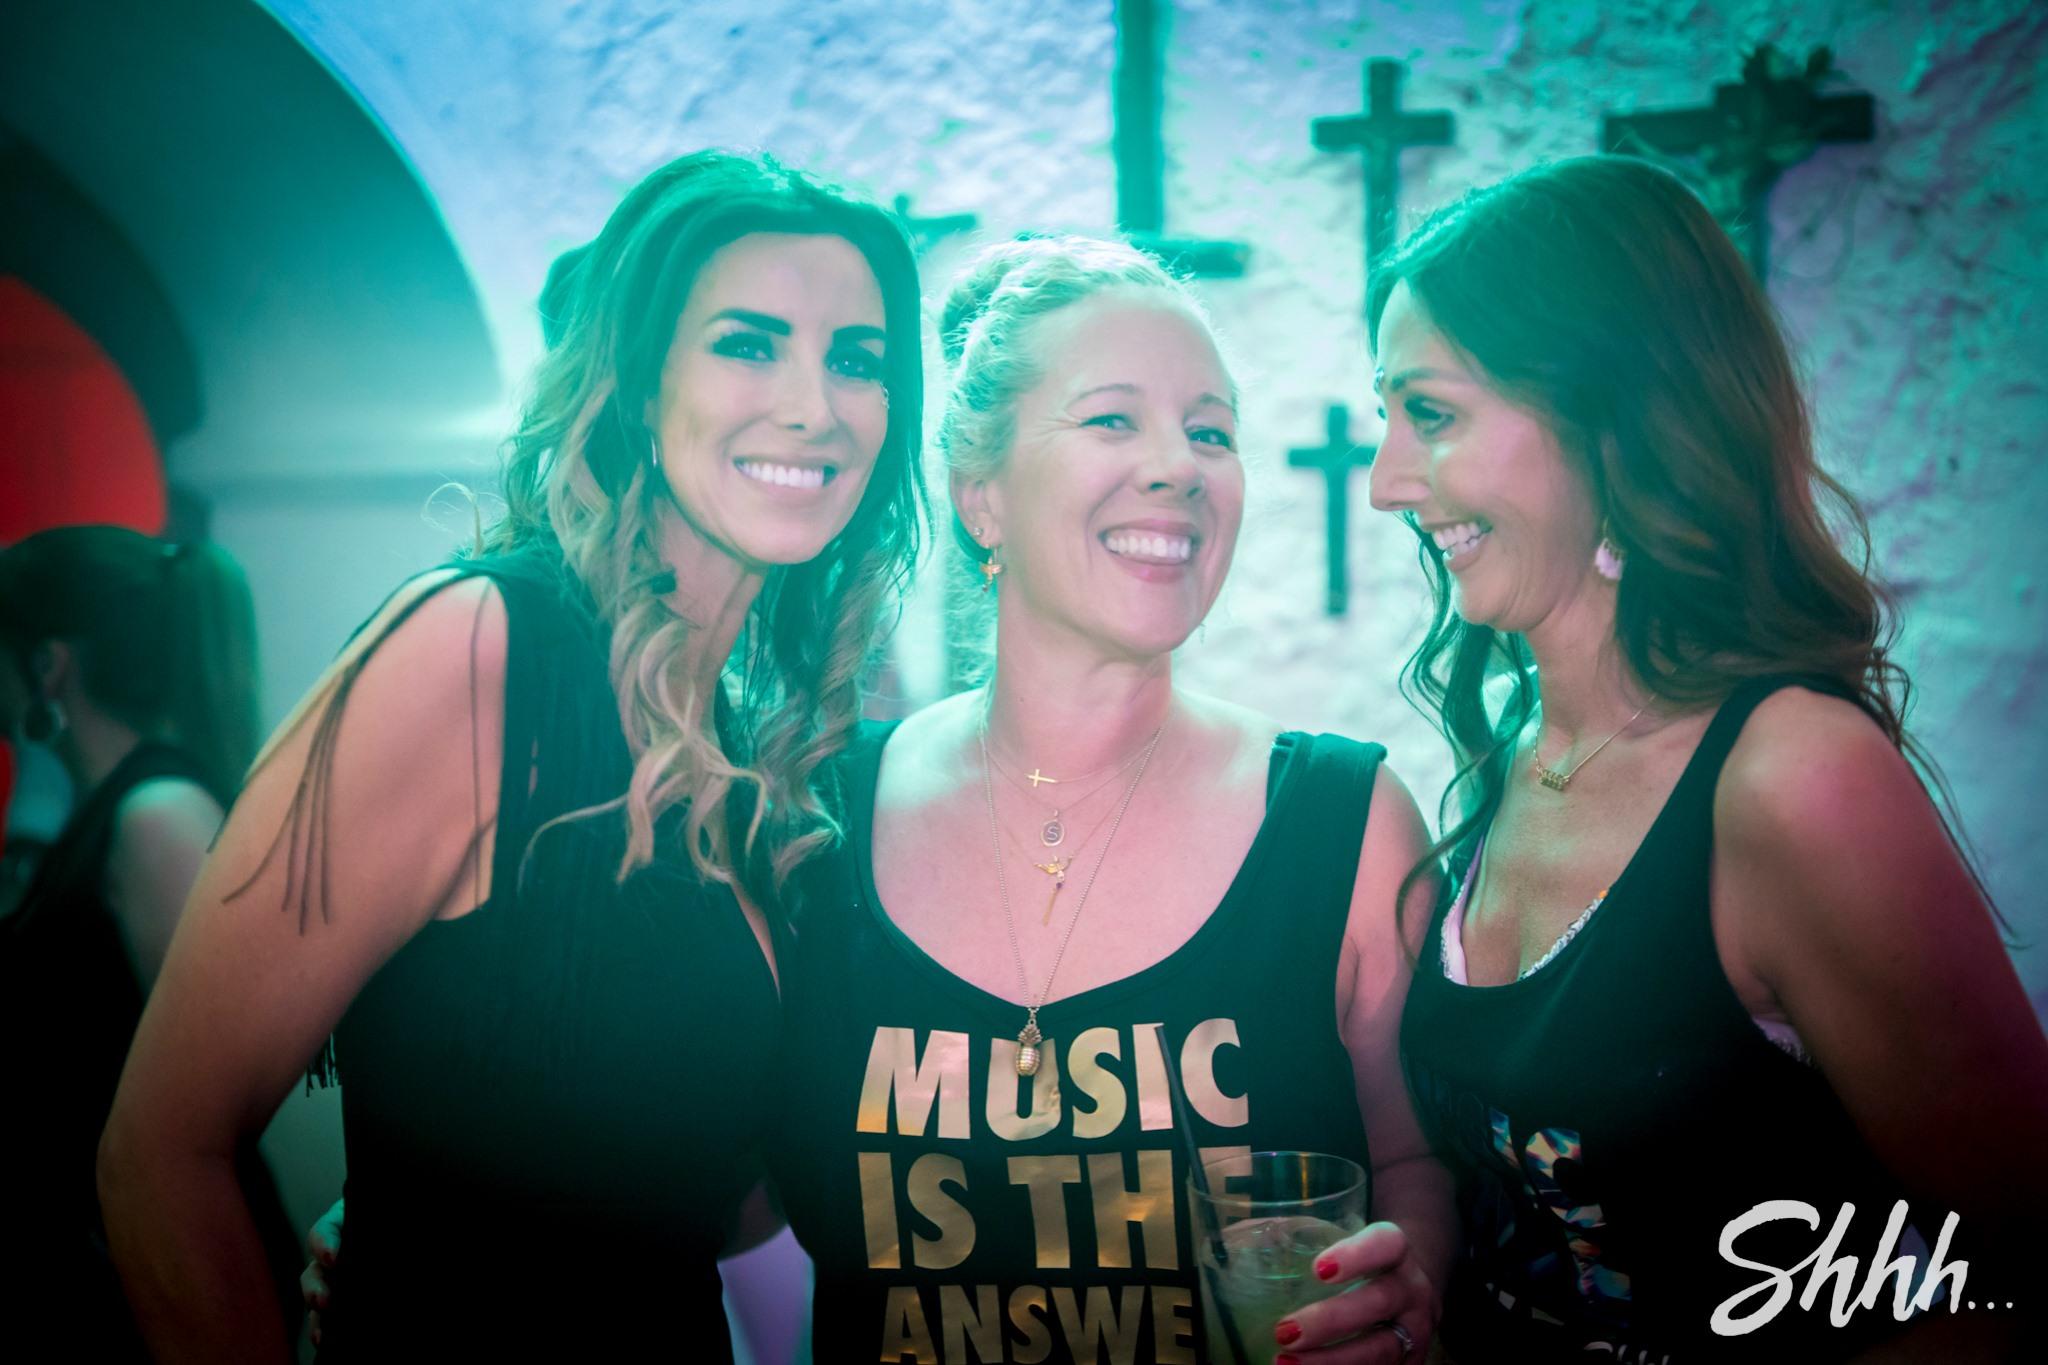 'Music is the answer' loyal Shhh... familia